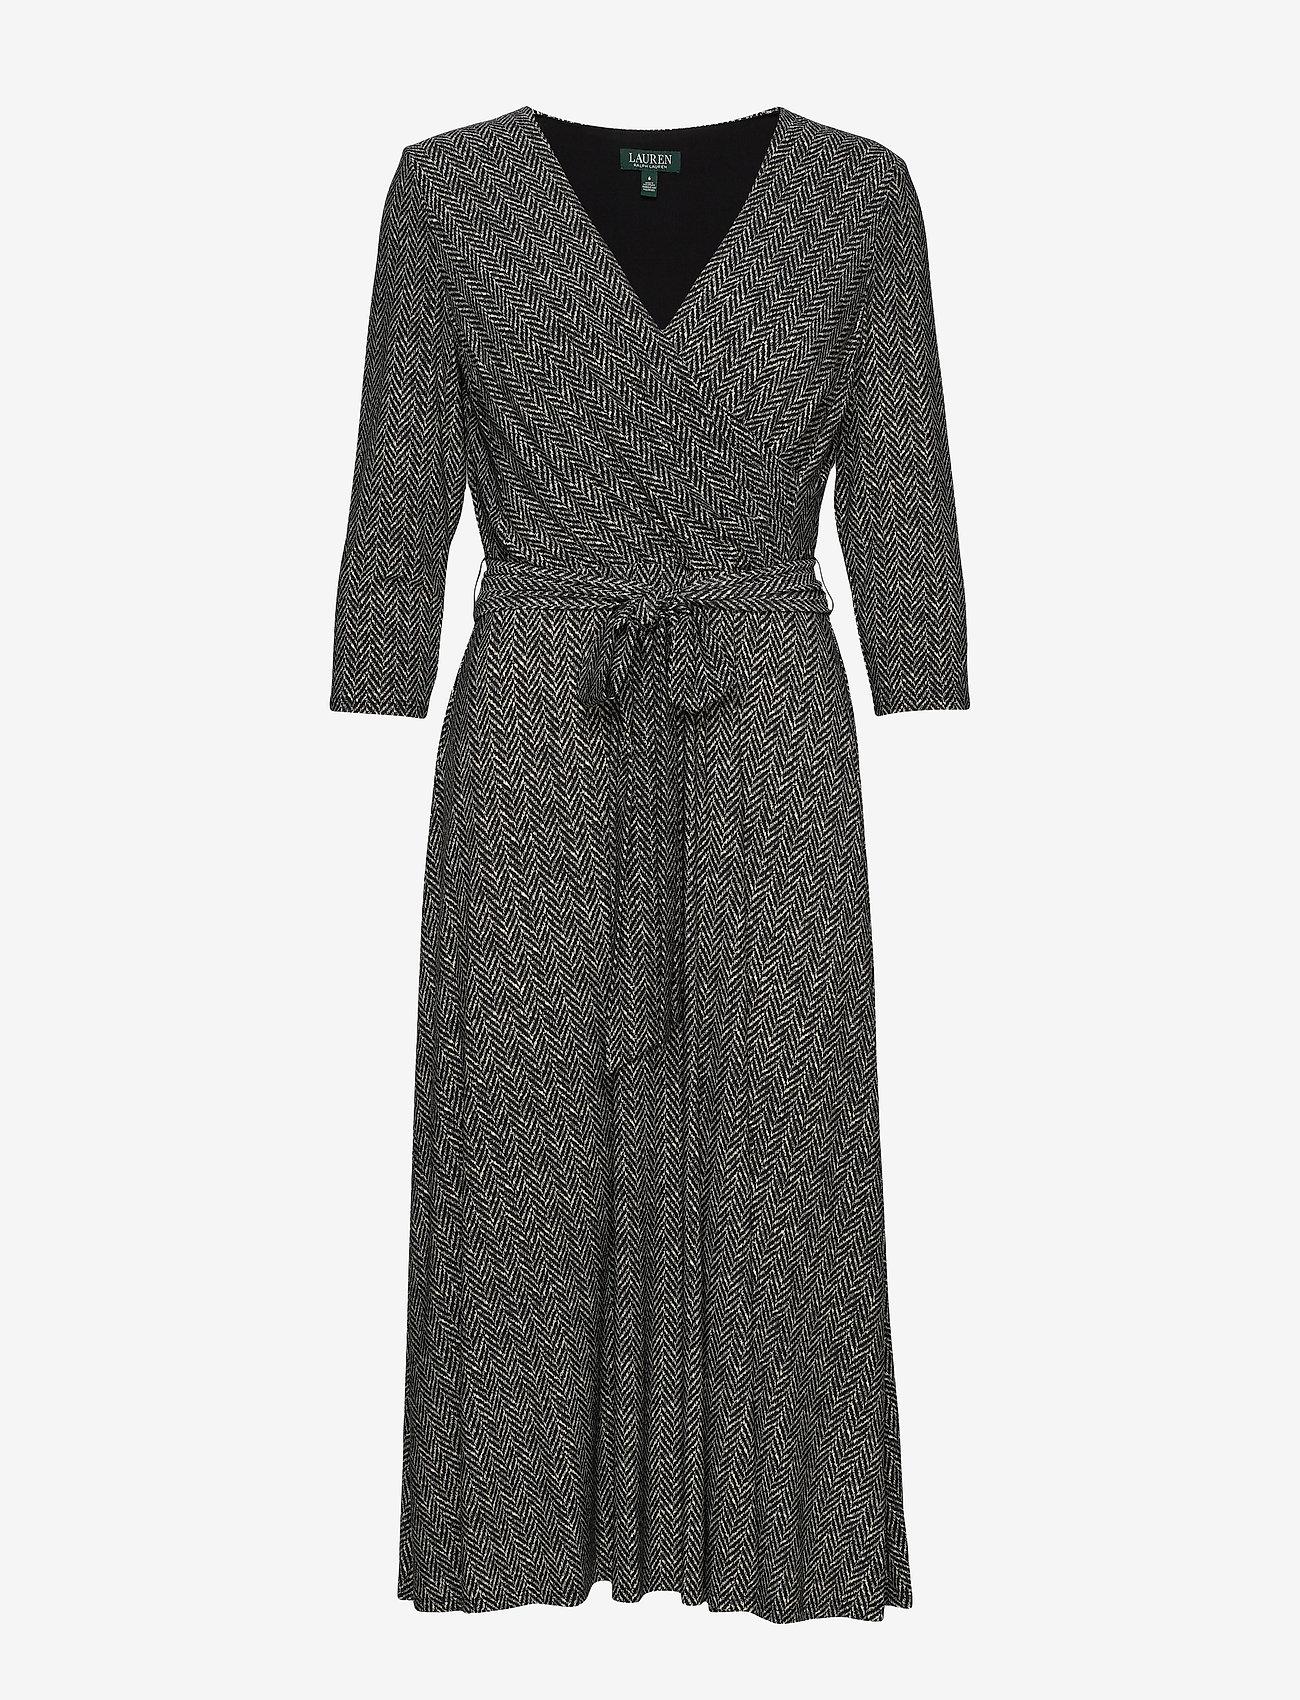 Lauren Ralph Lauren - PRINTED MATTE JRSY-DRESS - wrap dresses - sparkling champag - 0